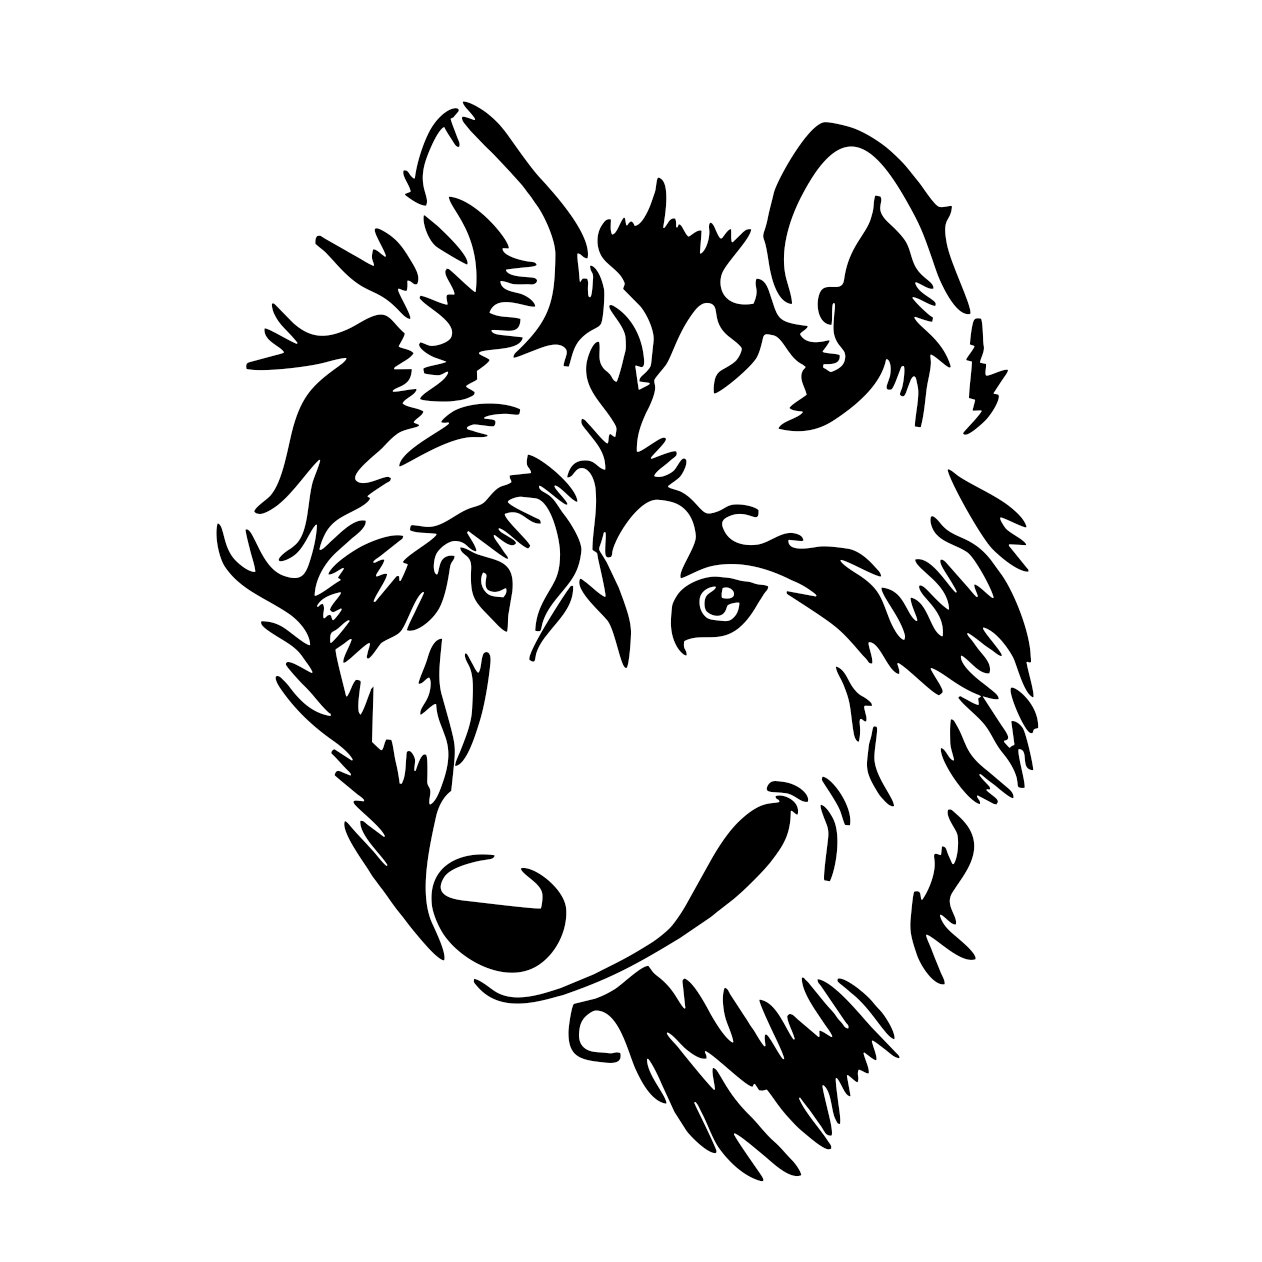 Wolf Head Wild Graphics Design Svg Dxf Eps By Vectordesign